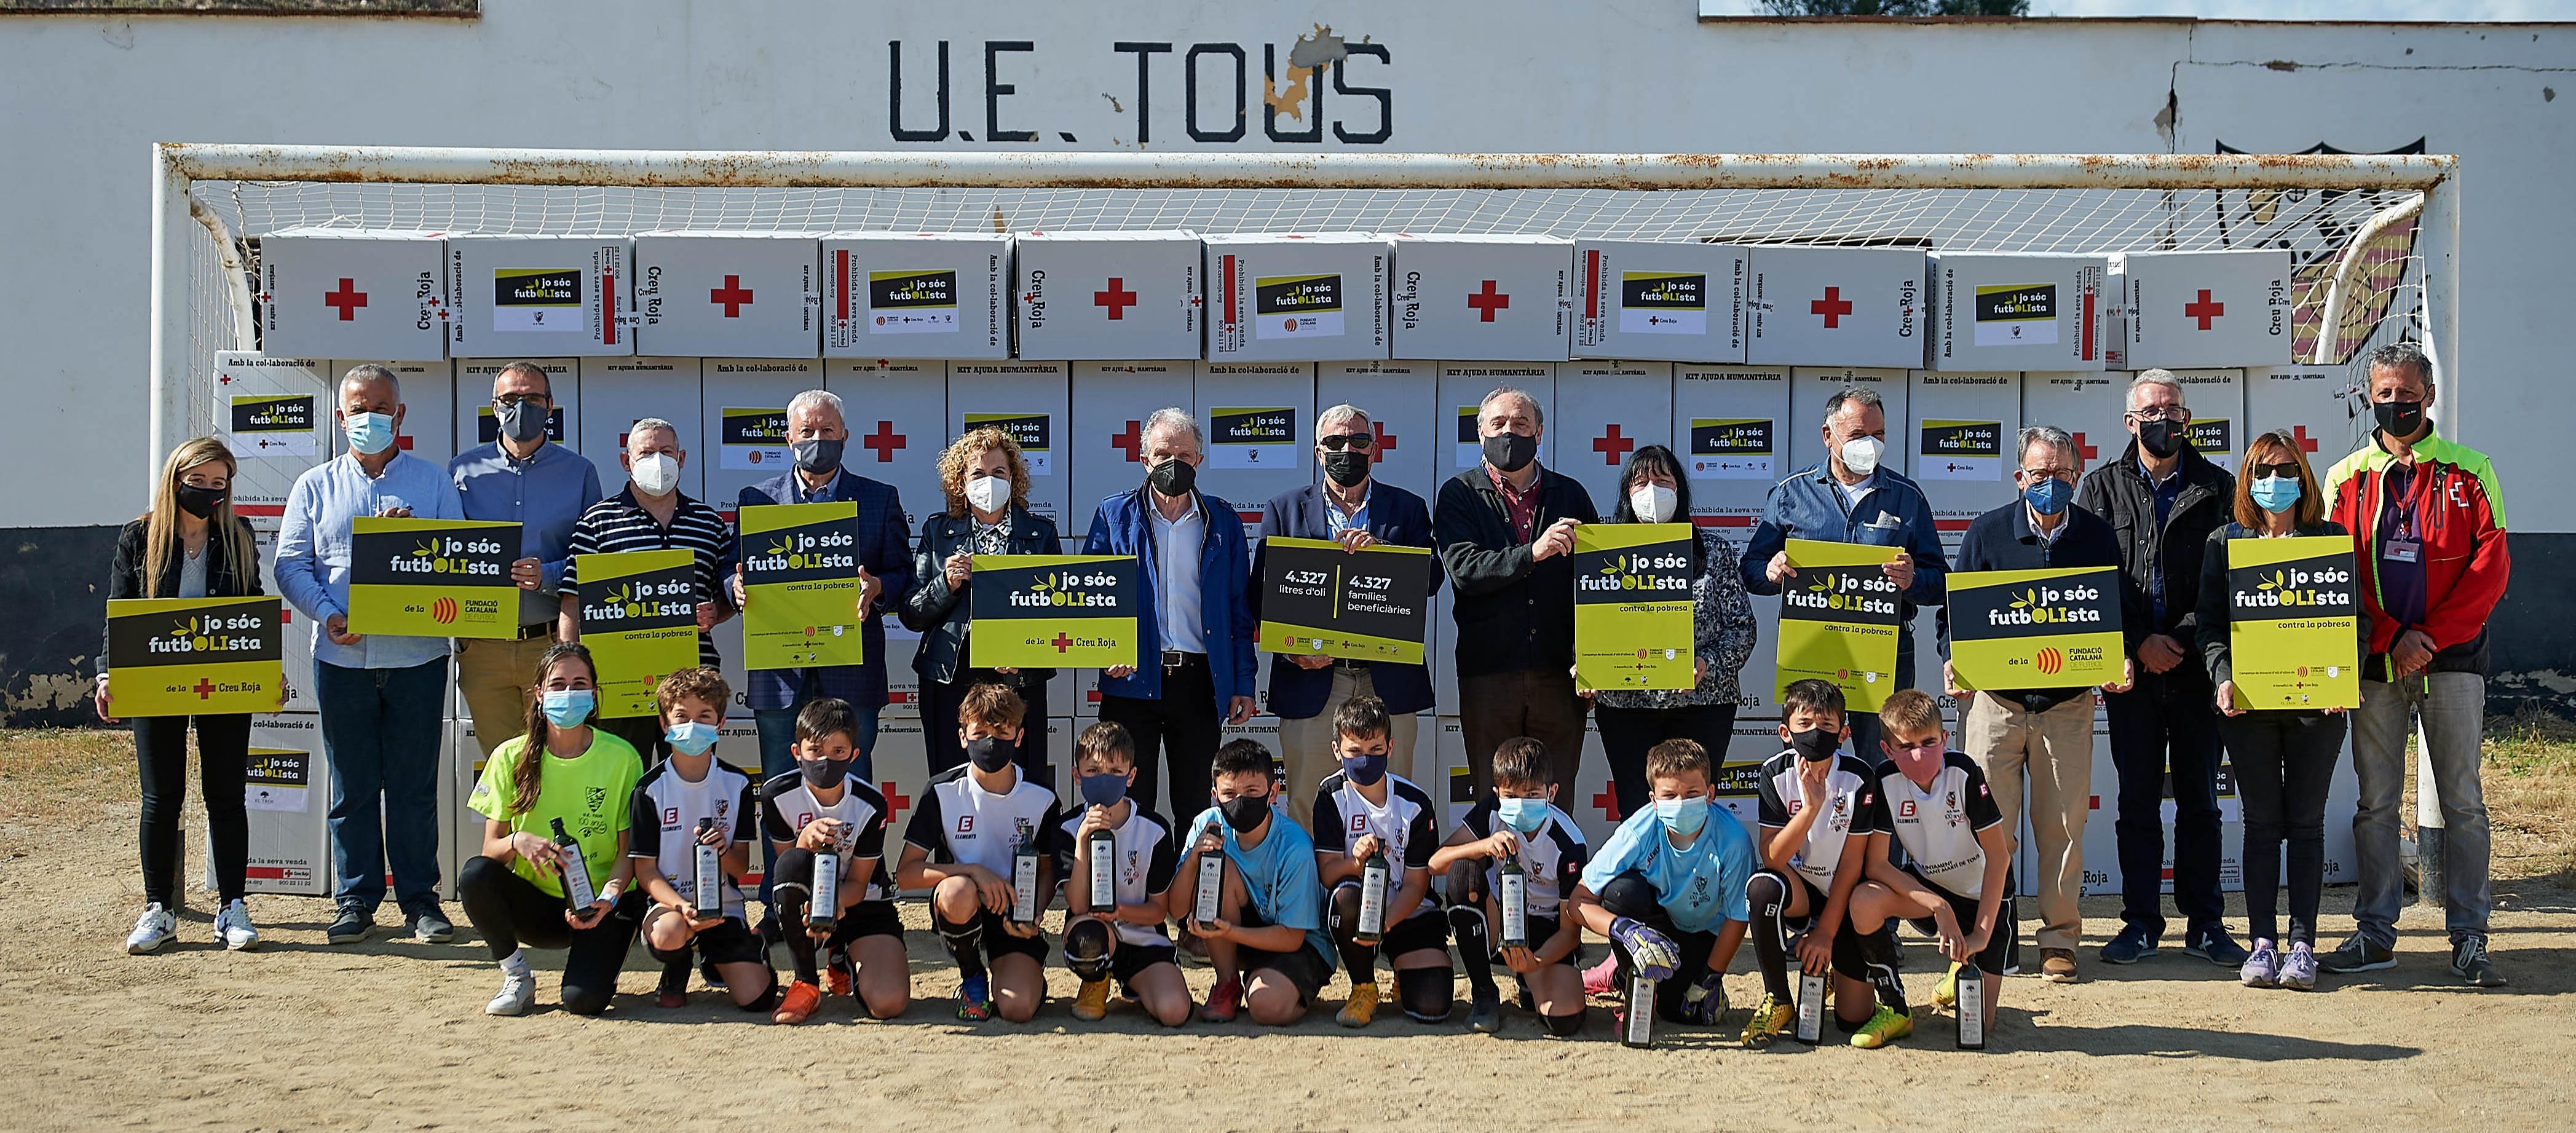 La campanya 'Jo soc futbOLIsta' dona 4.327 litres d'oli d'oliva verge extra